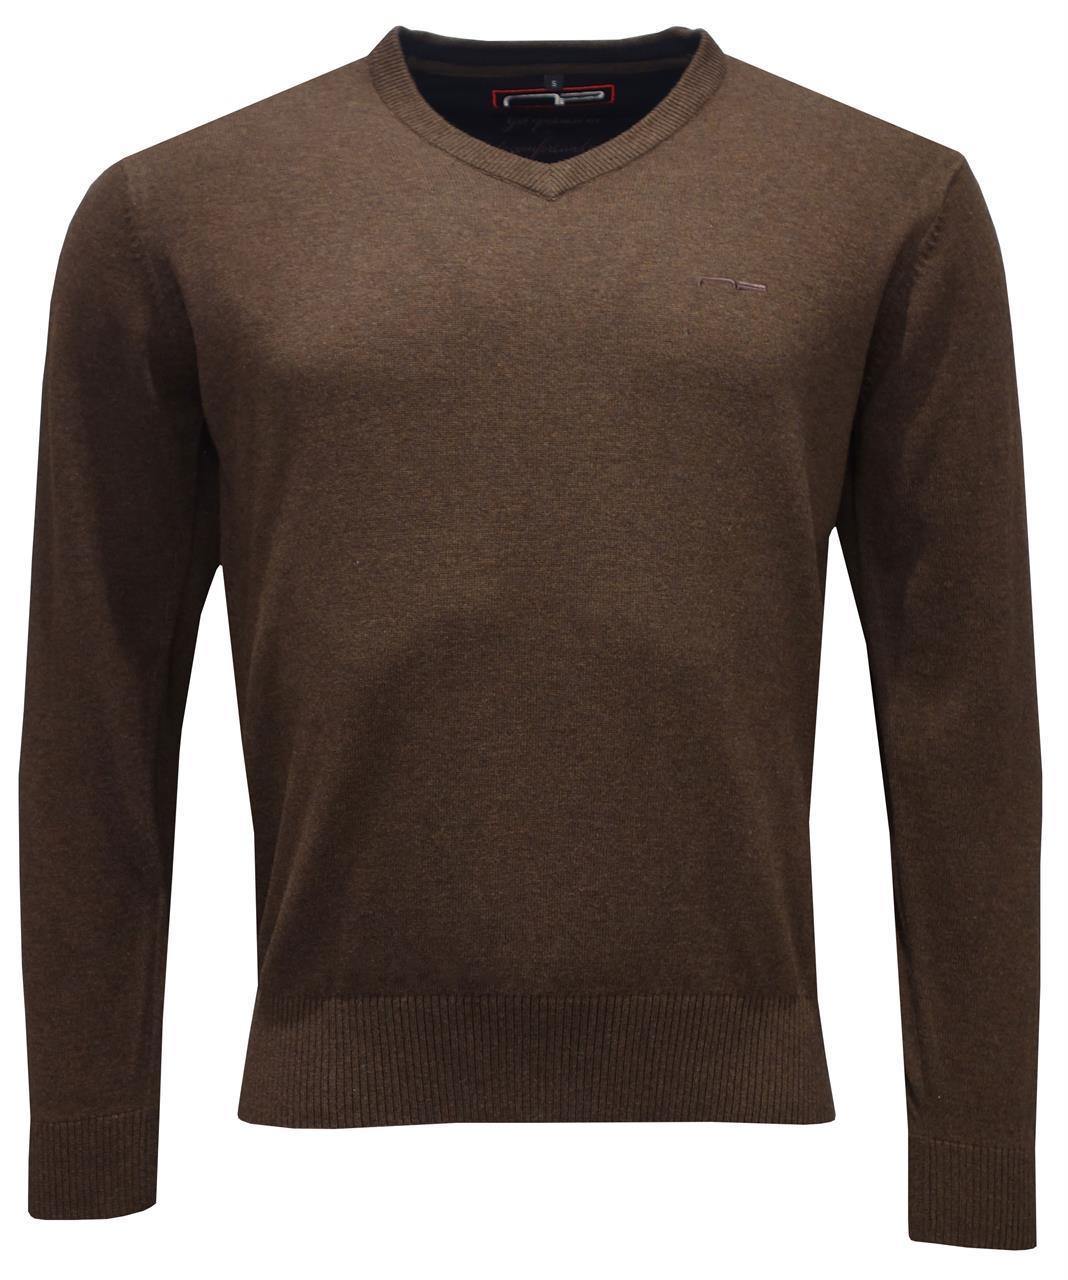 V -neck 1670 M Brown S